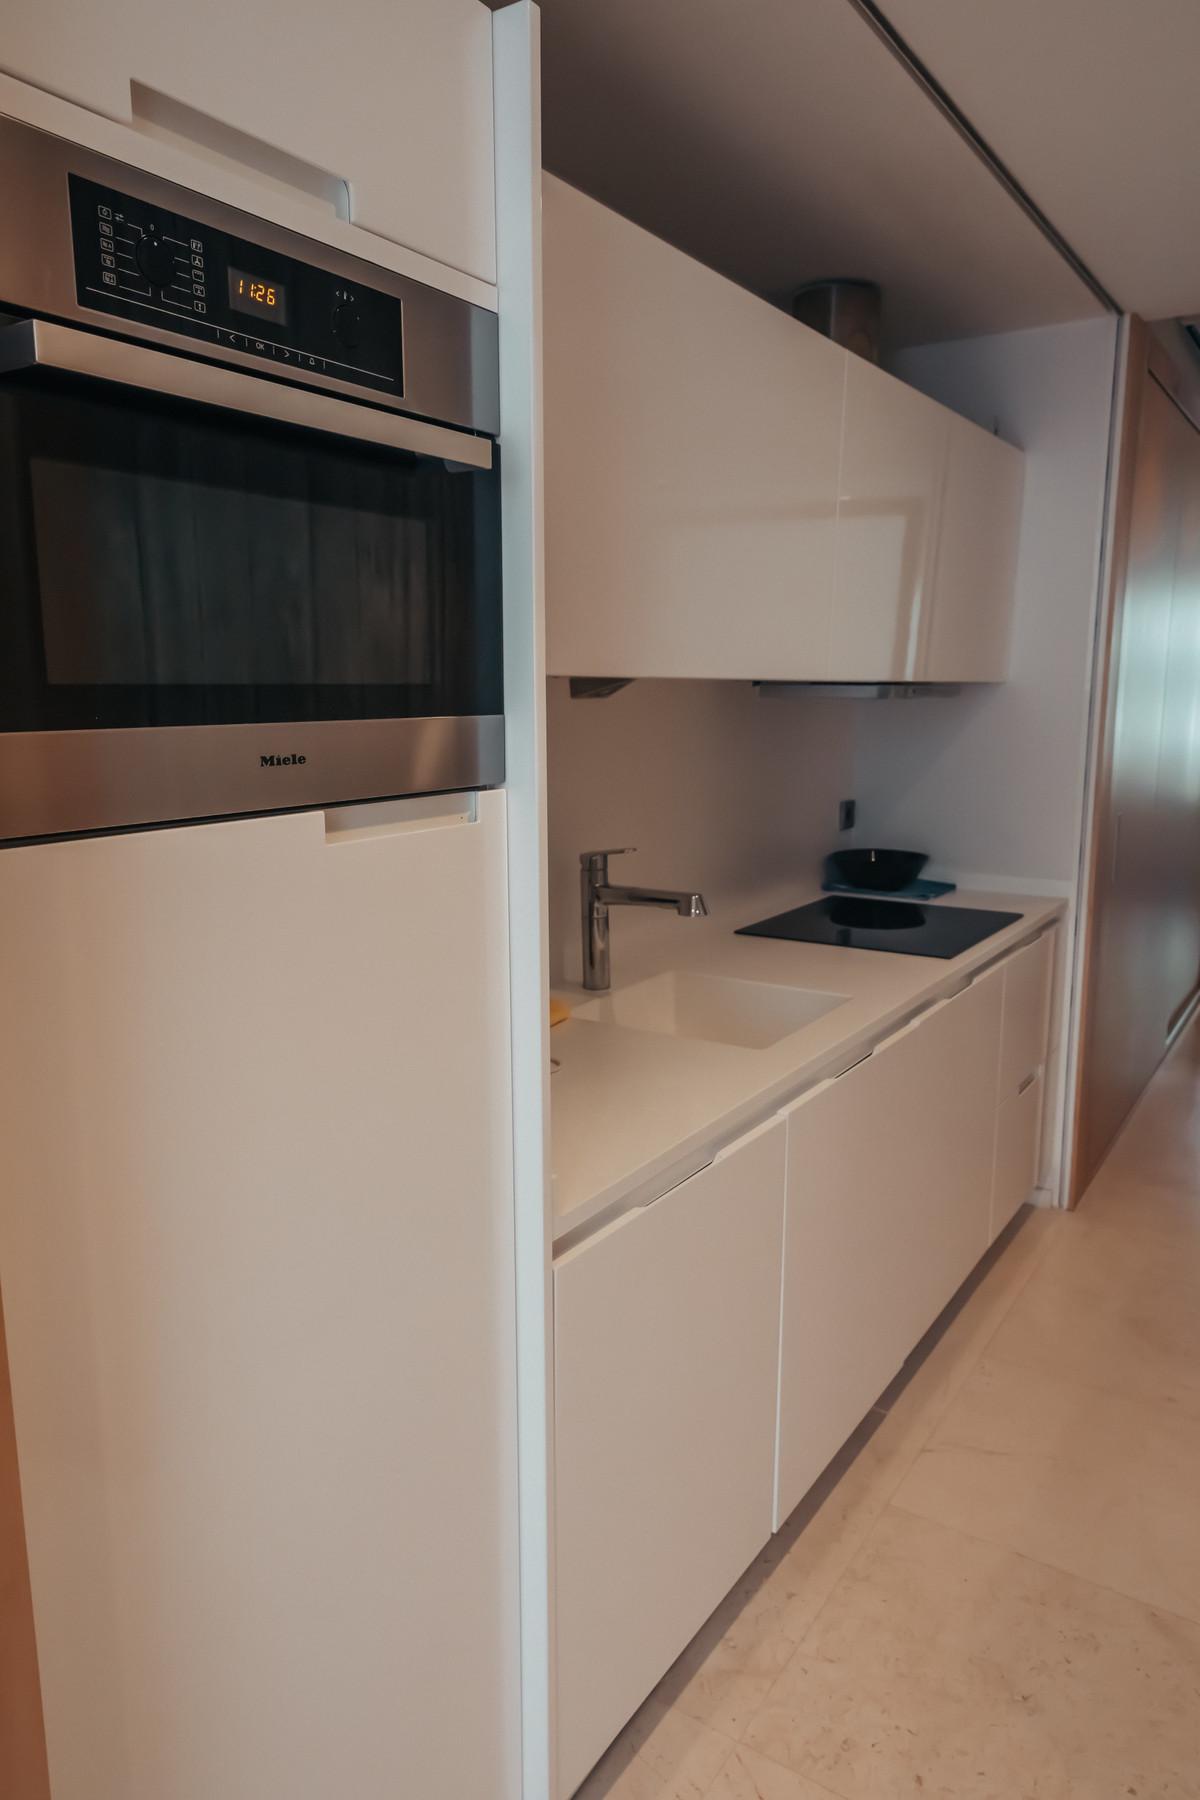 Long Term Rental - Ground Floor Studio - The Golden Mile - 7 - mibgroup.es